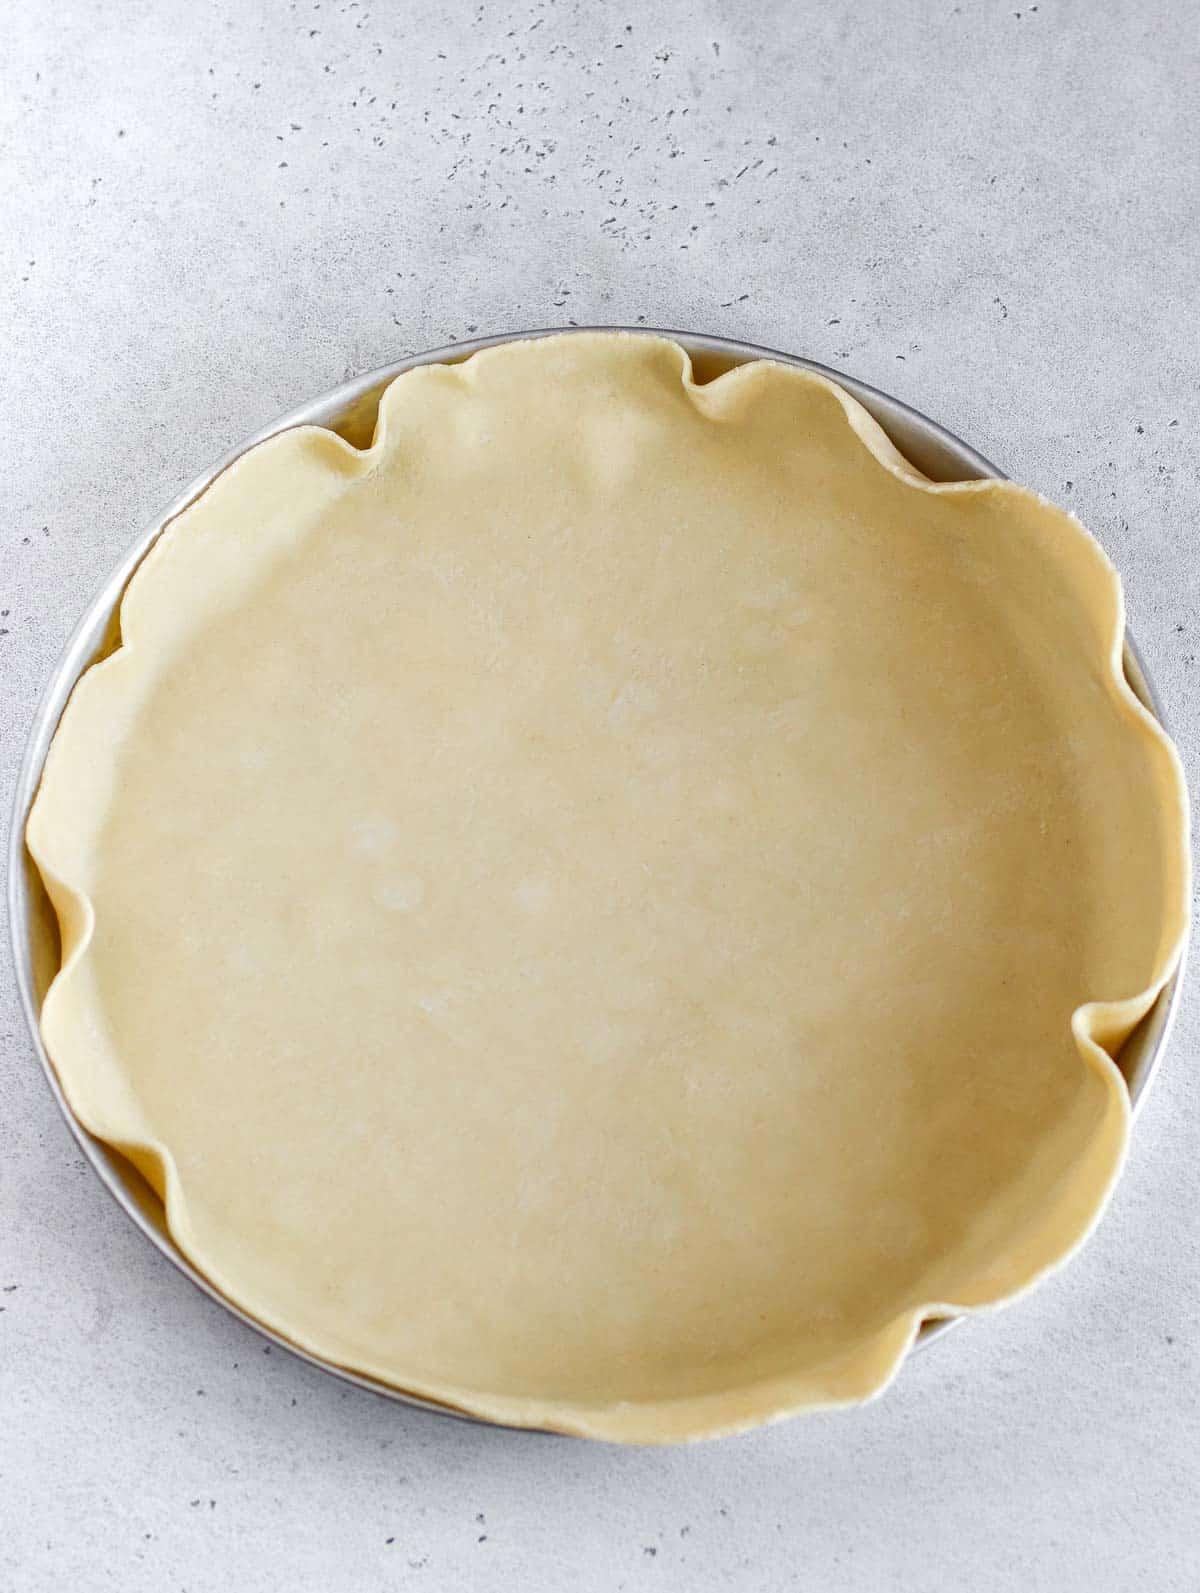 pie dish with the pie crust inside